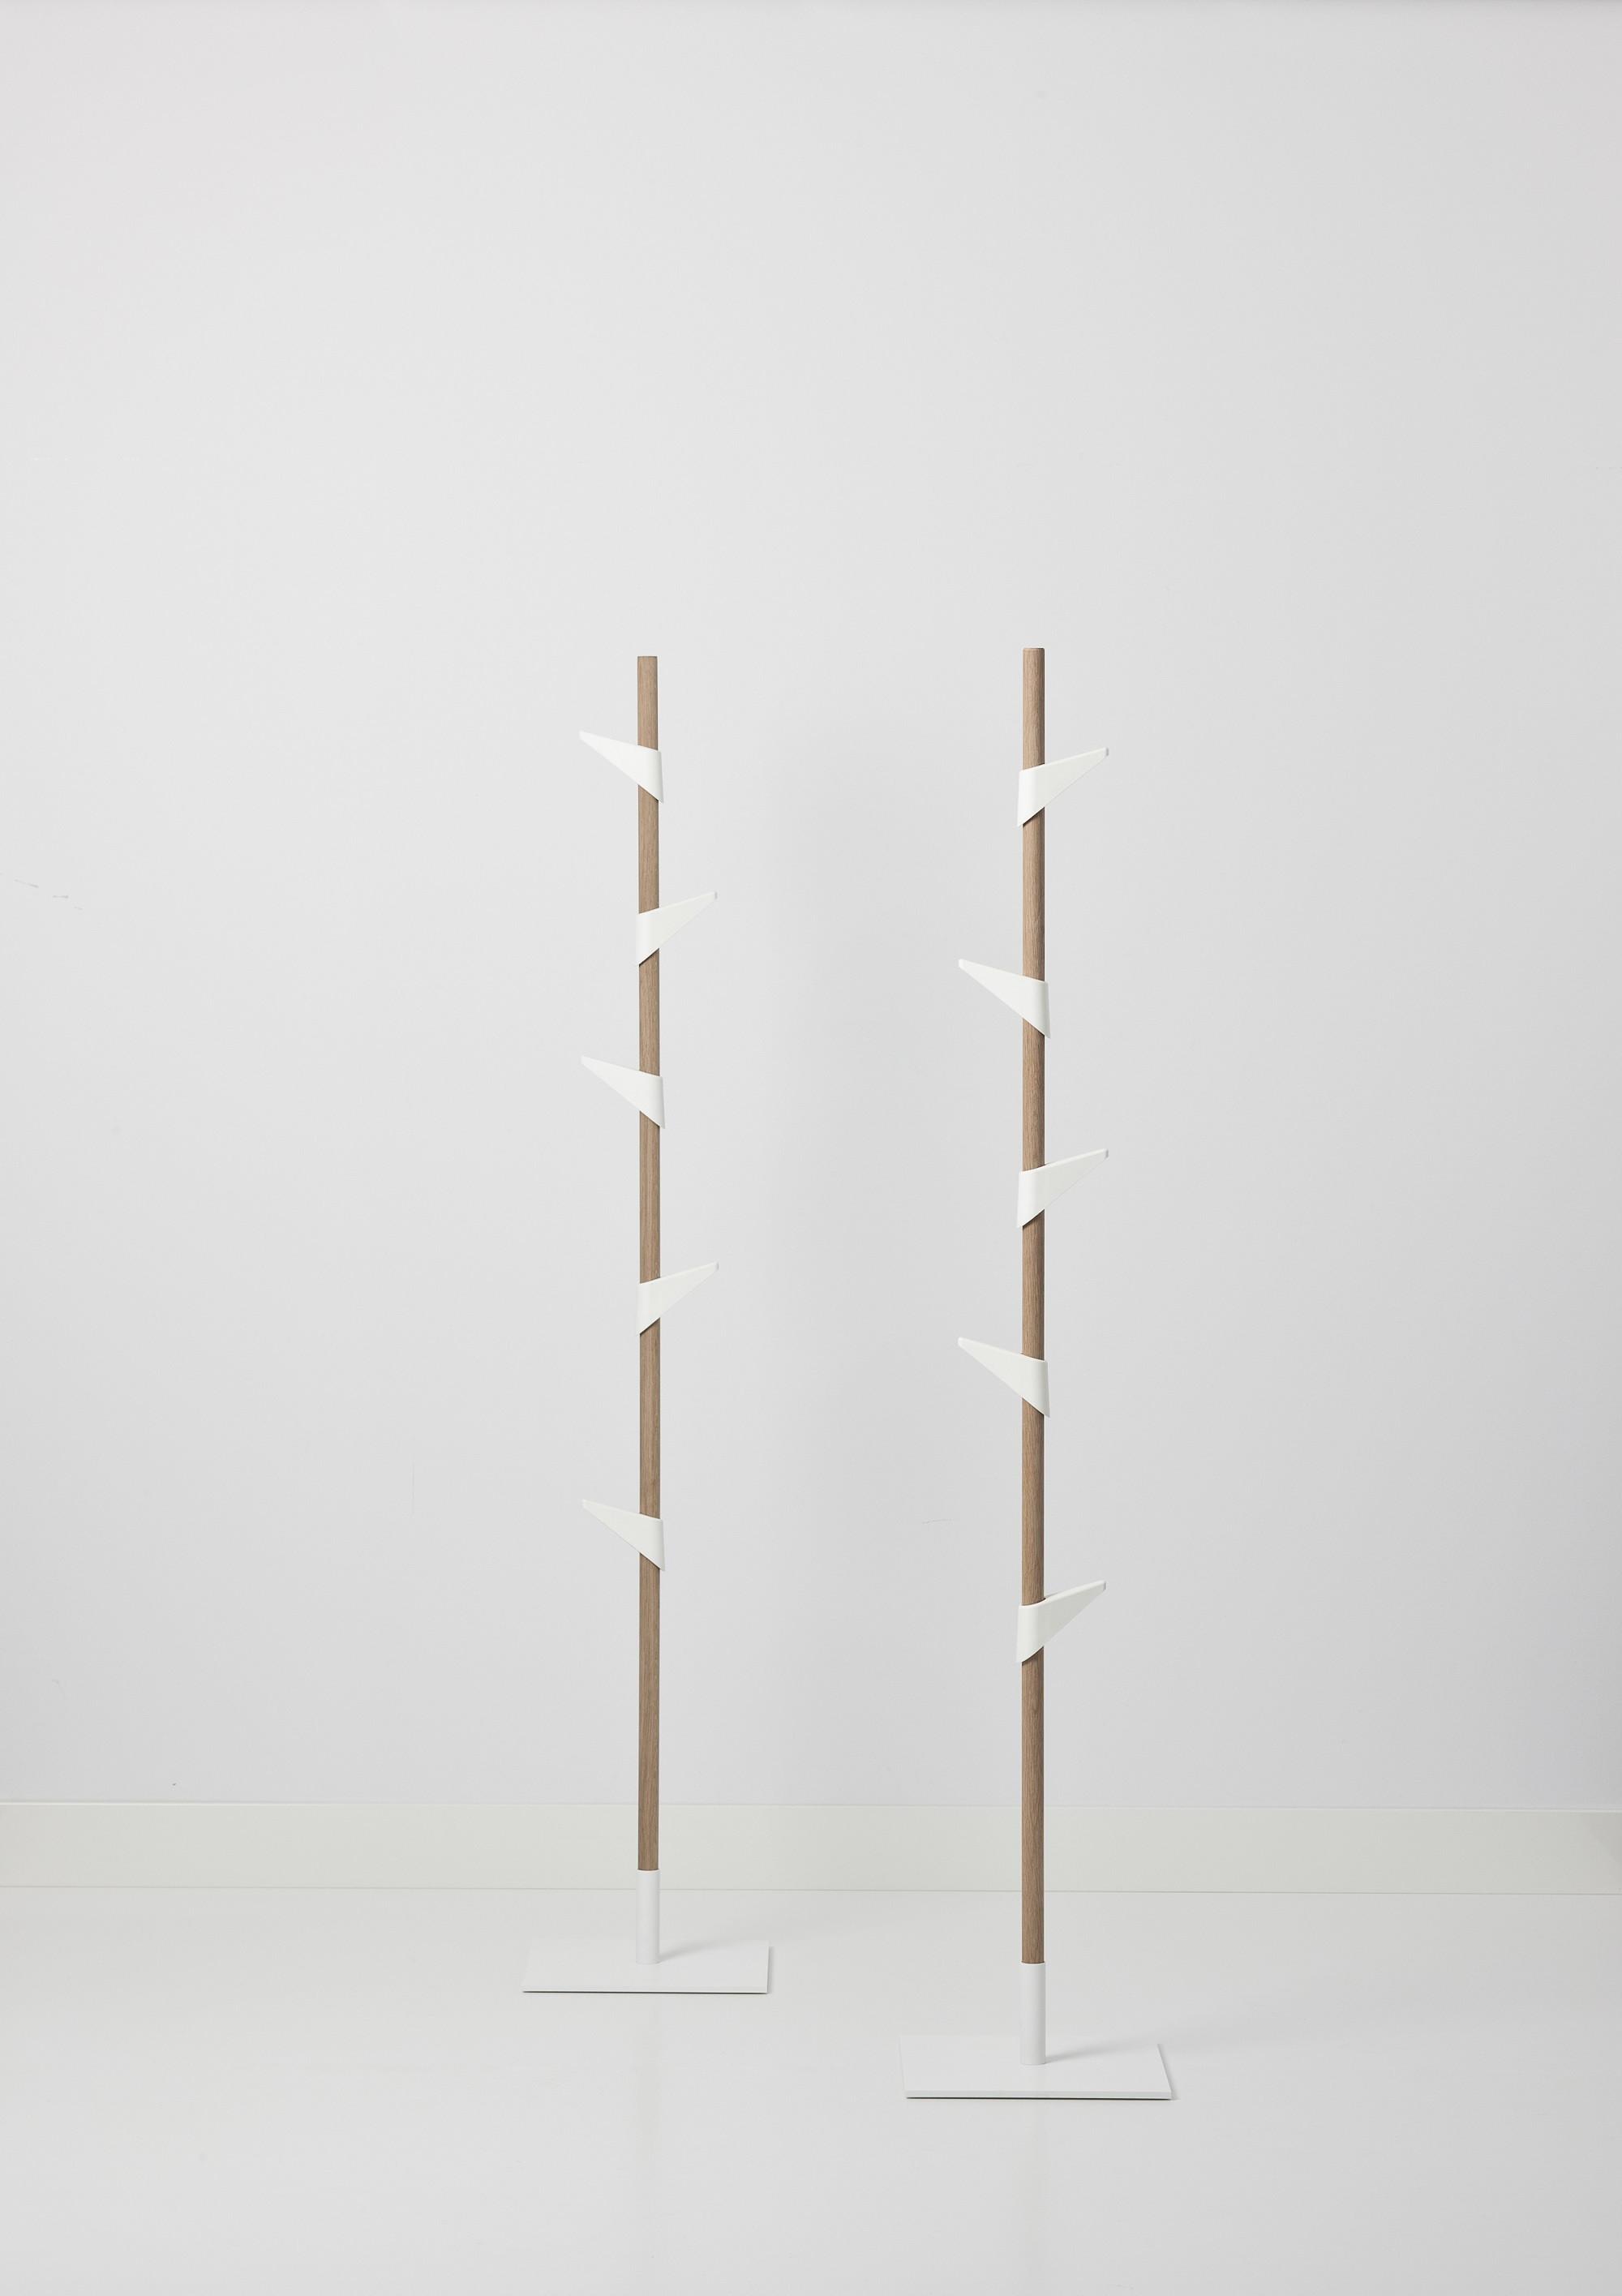 Bamboo Coat Rack By Cascando On Shophollandcom - Designer coat rack